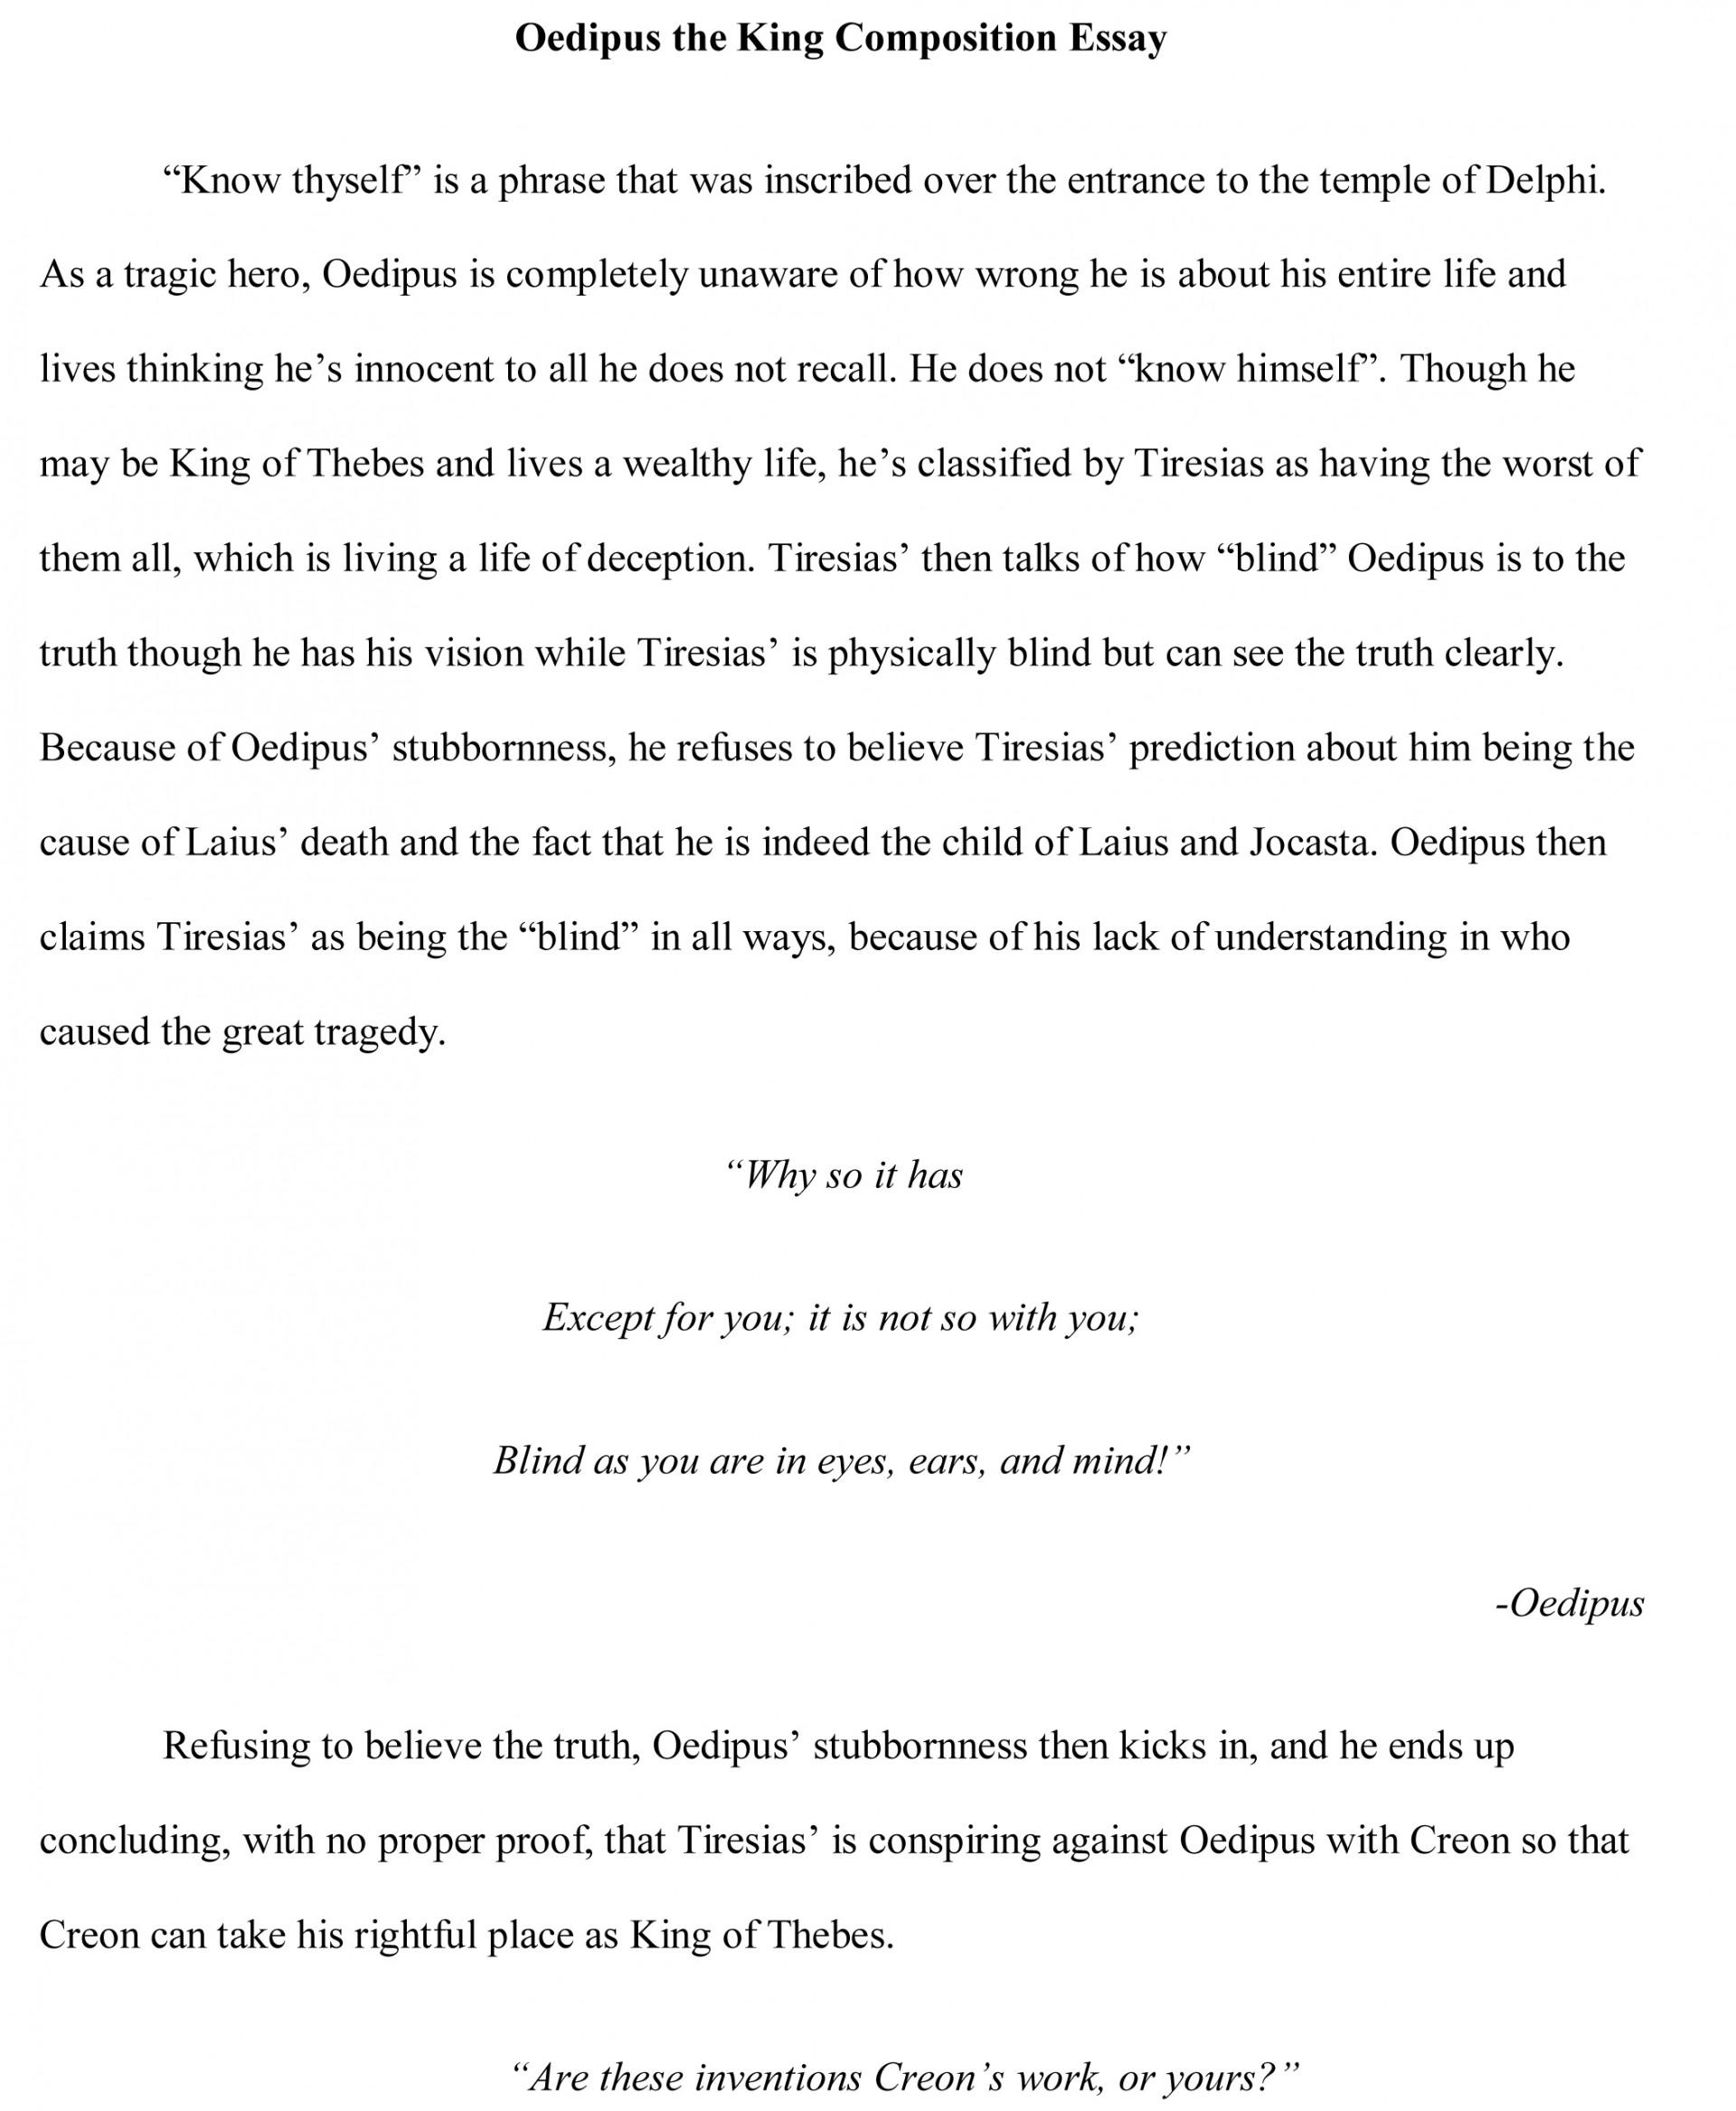 023 Good Essay Hooks Oedipus Free Sample Rare Generator Best Ever College 1920